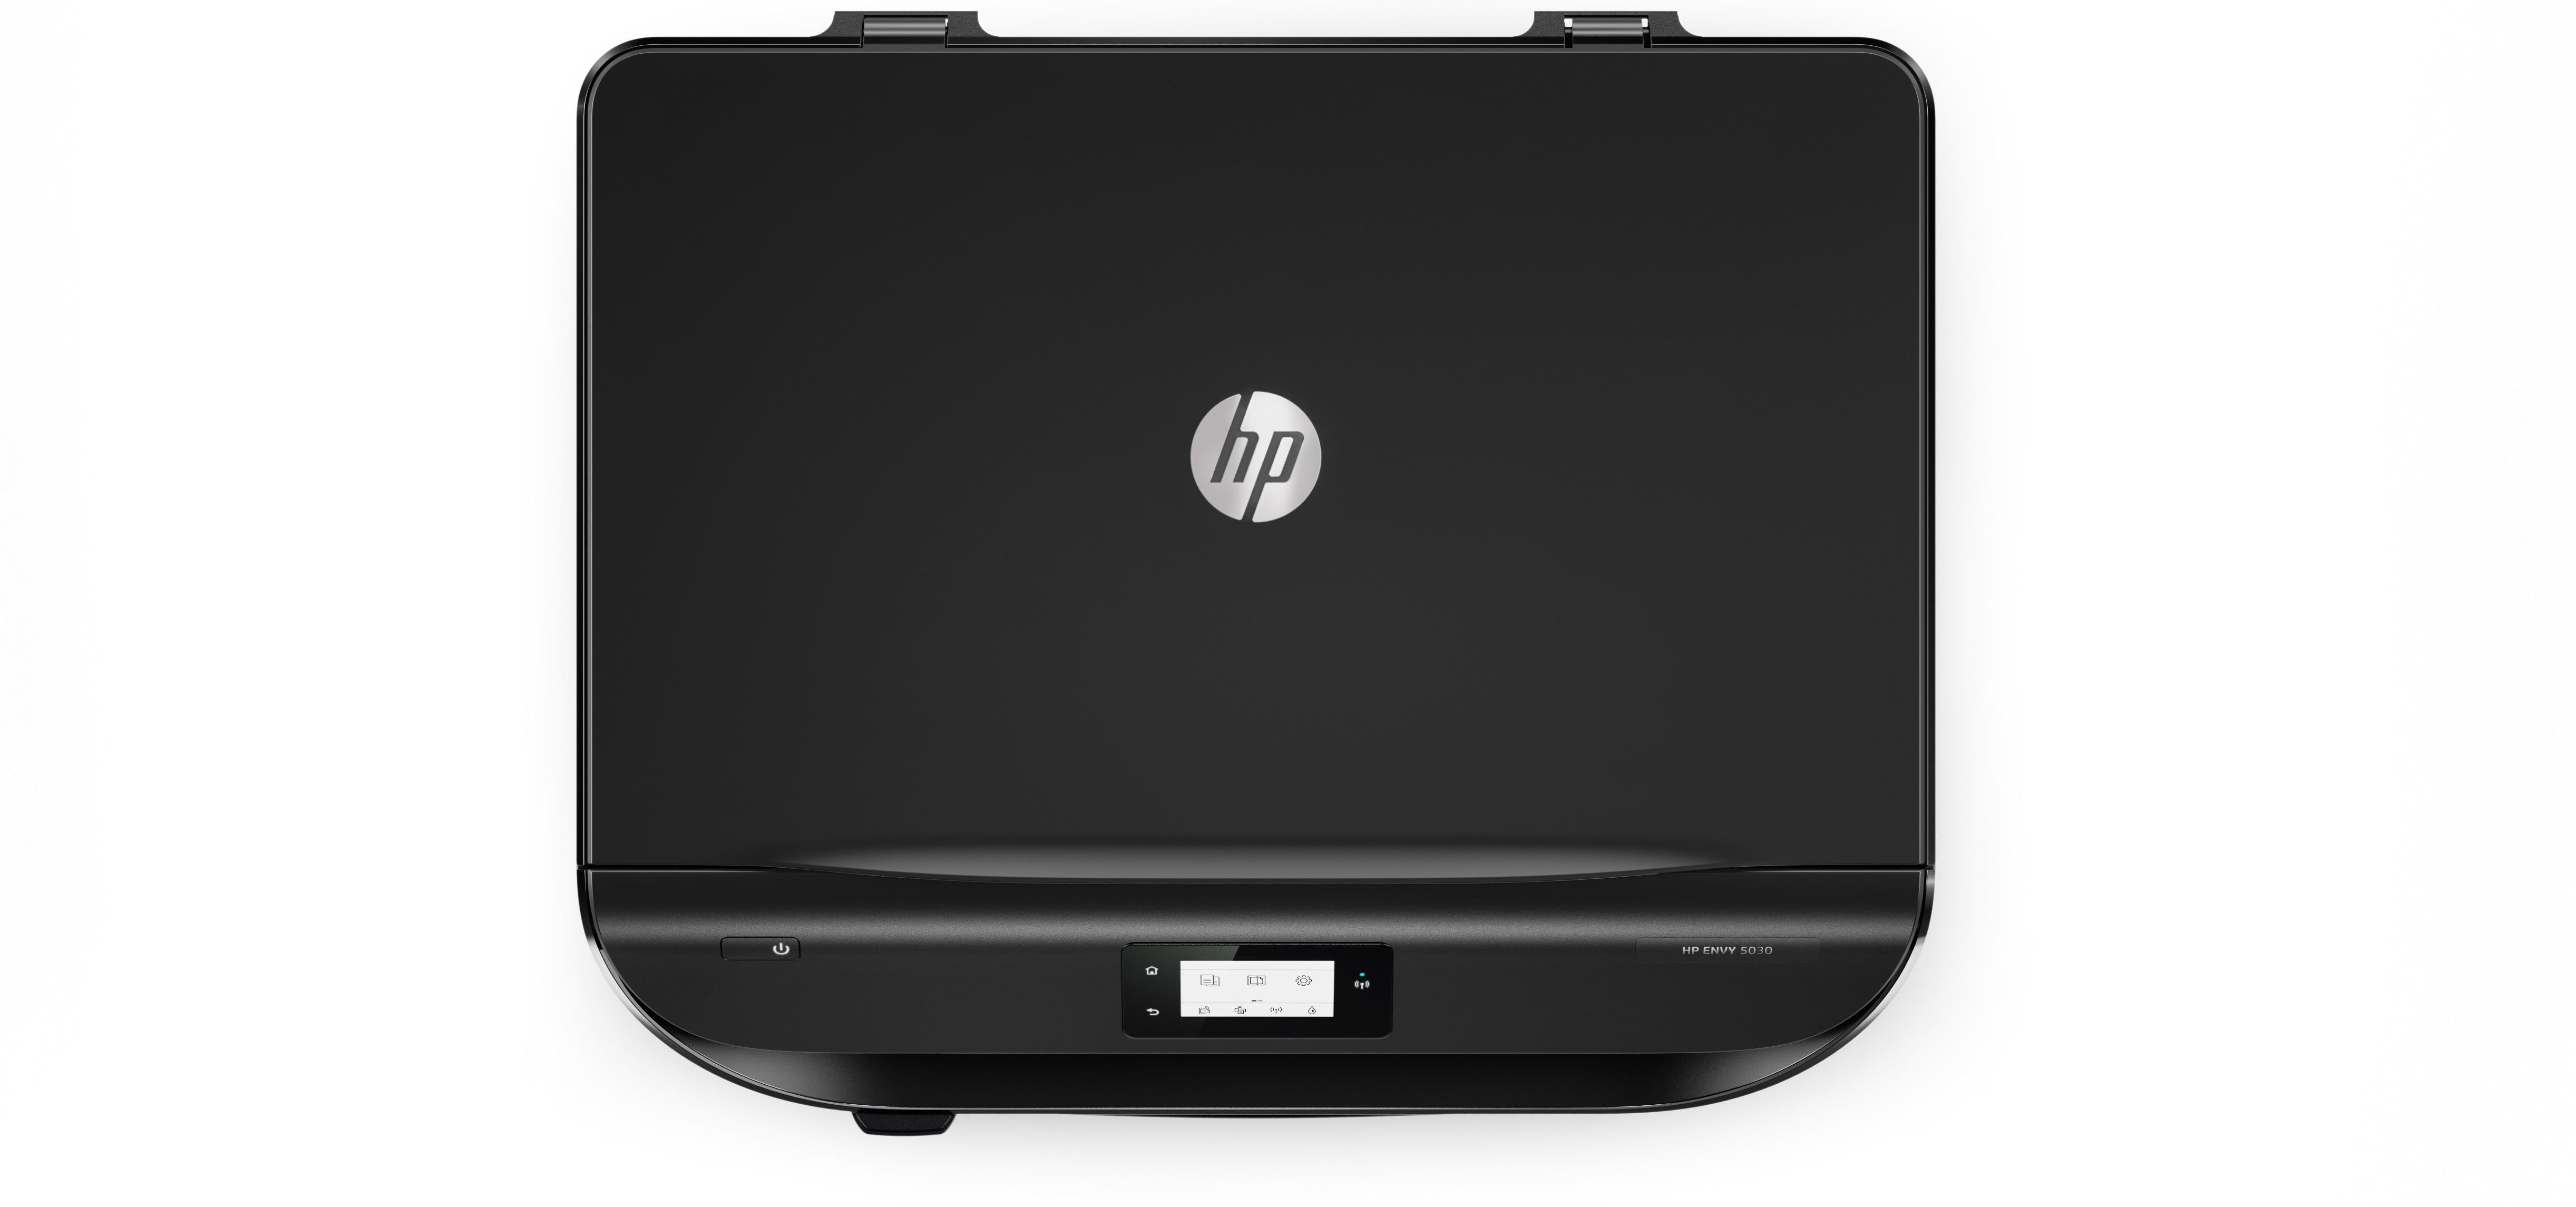 HP Envy 5030 all-in-one printer, kleur, inktjet, A4, A5, B5, max 20 ppm (printend), 100 vel, USB2, WiFi, WiFi-direct, Airprint, HP 304 / 304XL